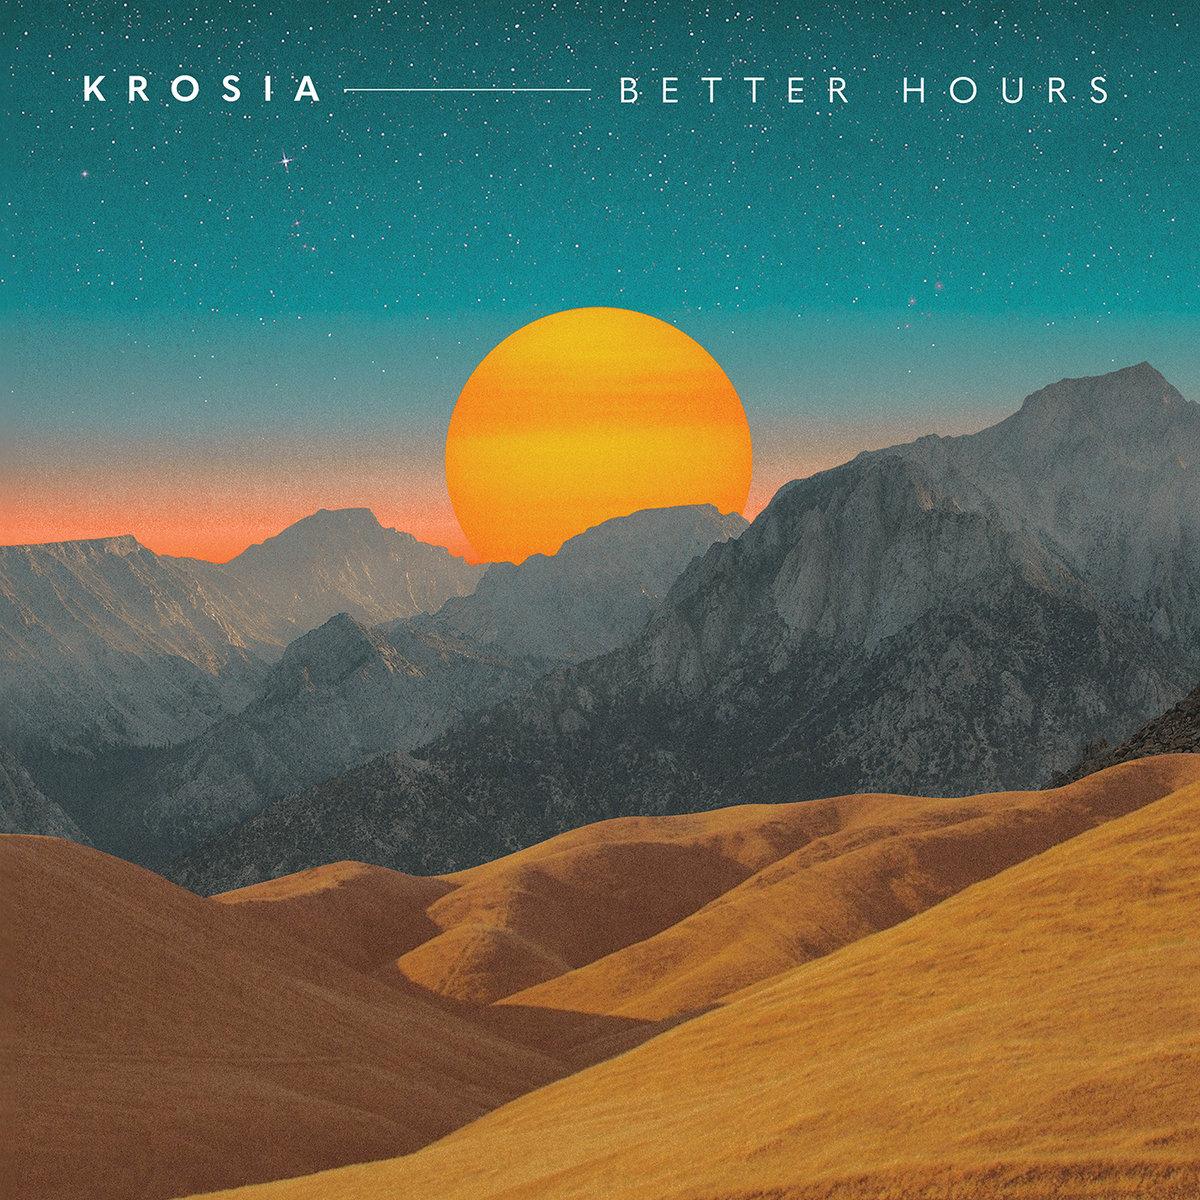 a2300647031 10 - Better Hours – Krosia